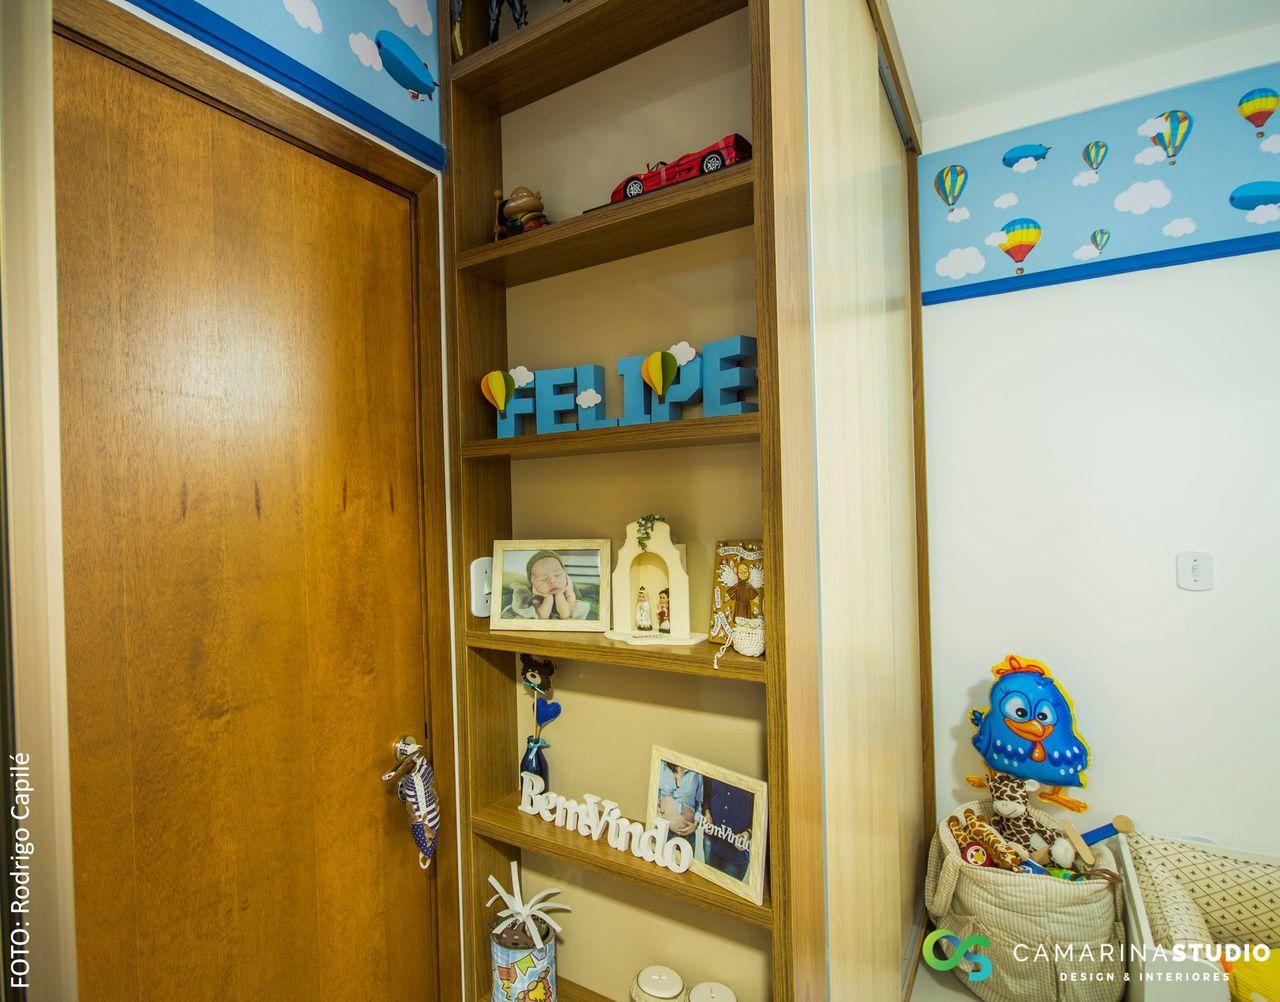 Quarto Infantil Masculino De Rica Marina 158098 No Viva Decora ~ Decoração Quarto Infantil Masculino